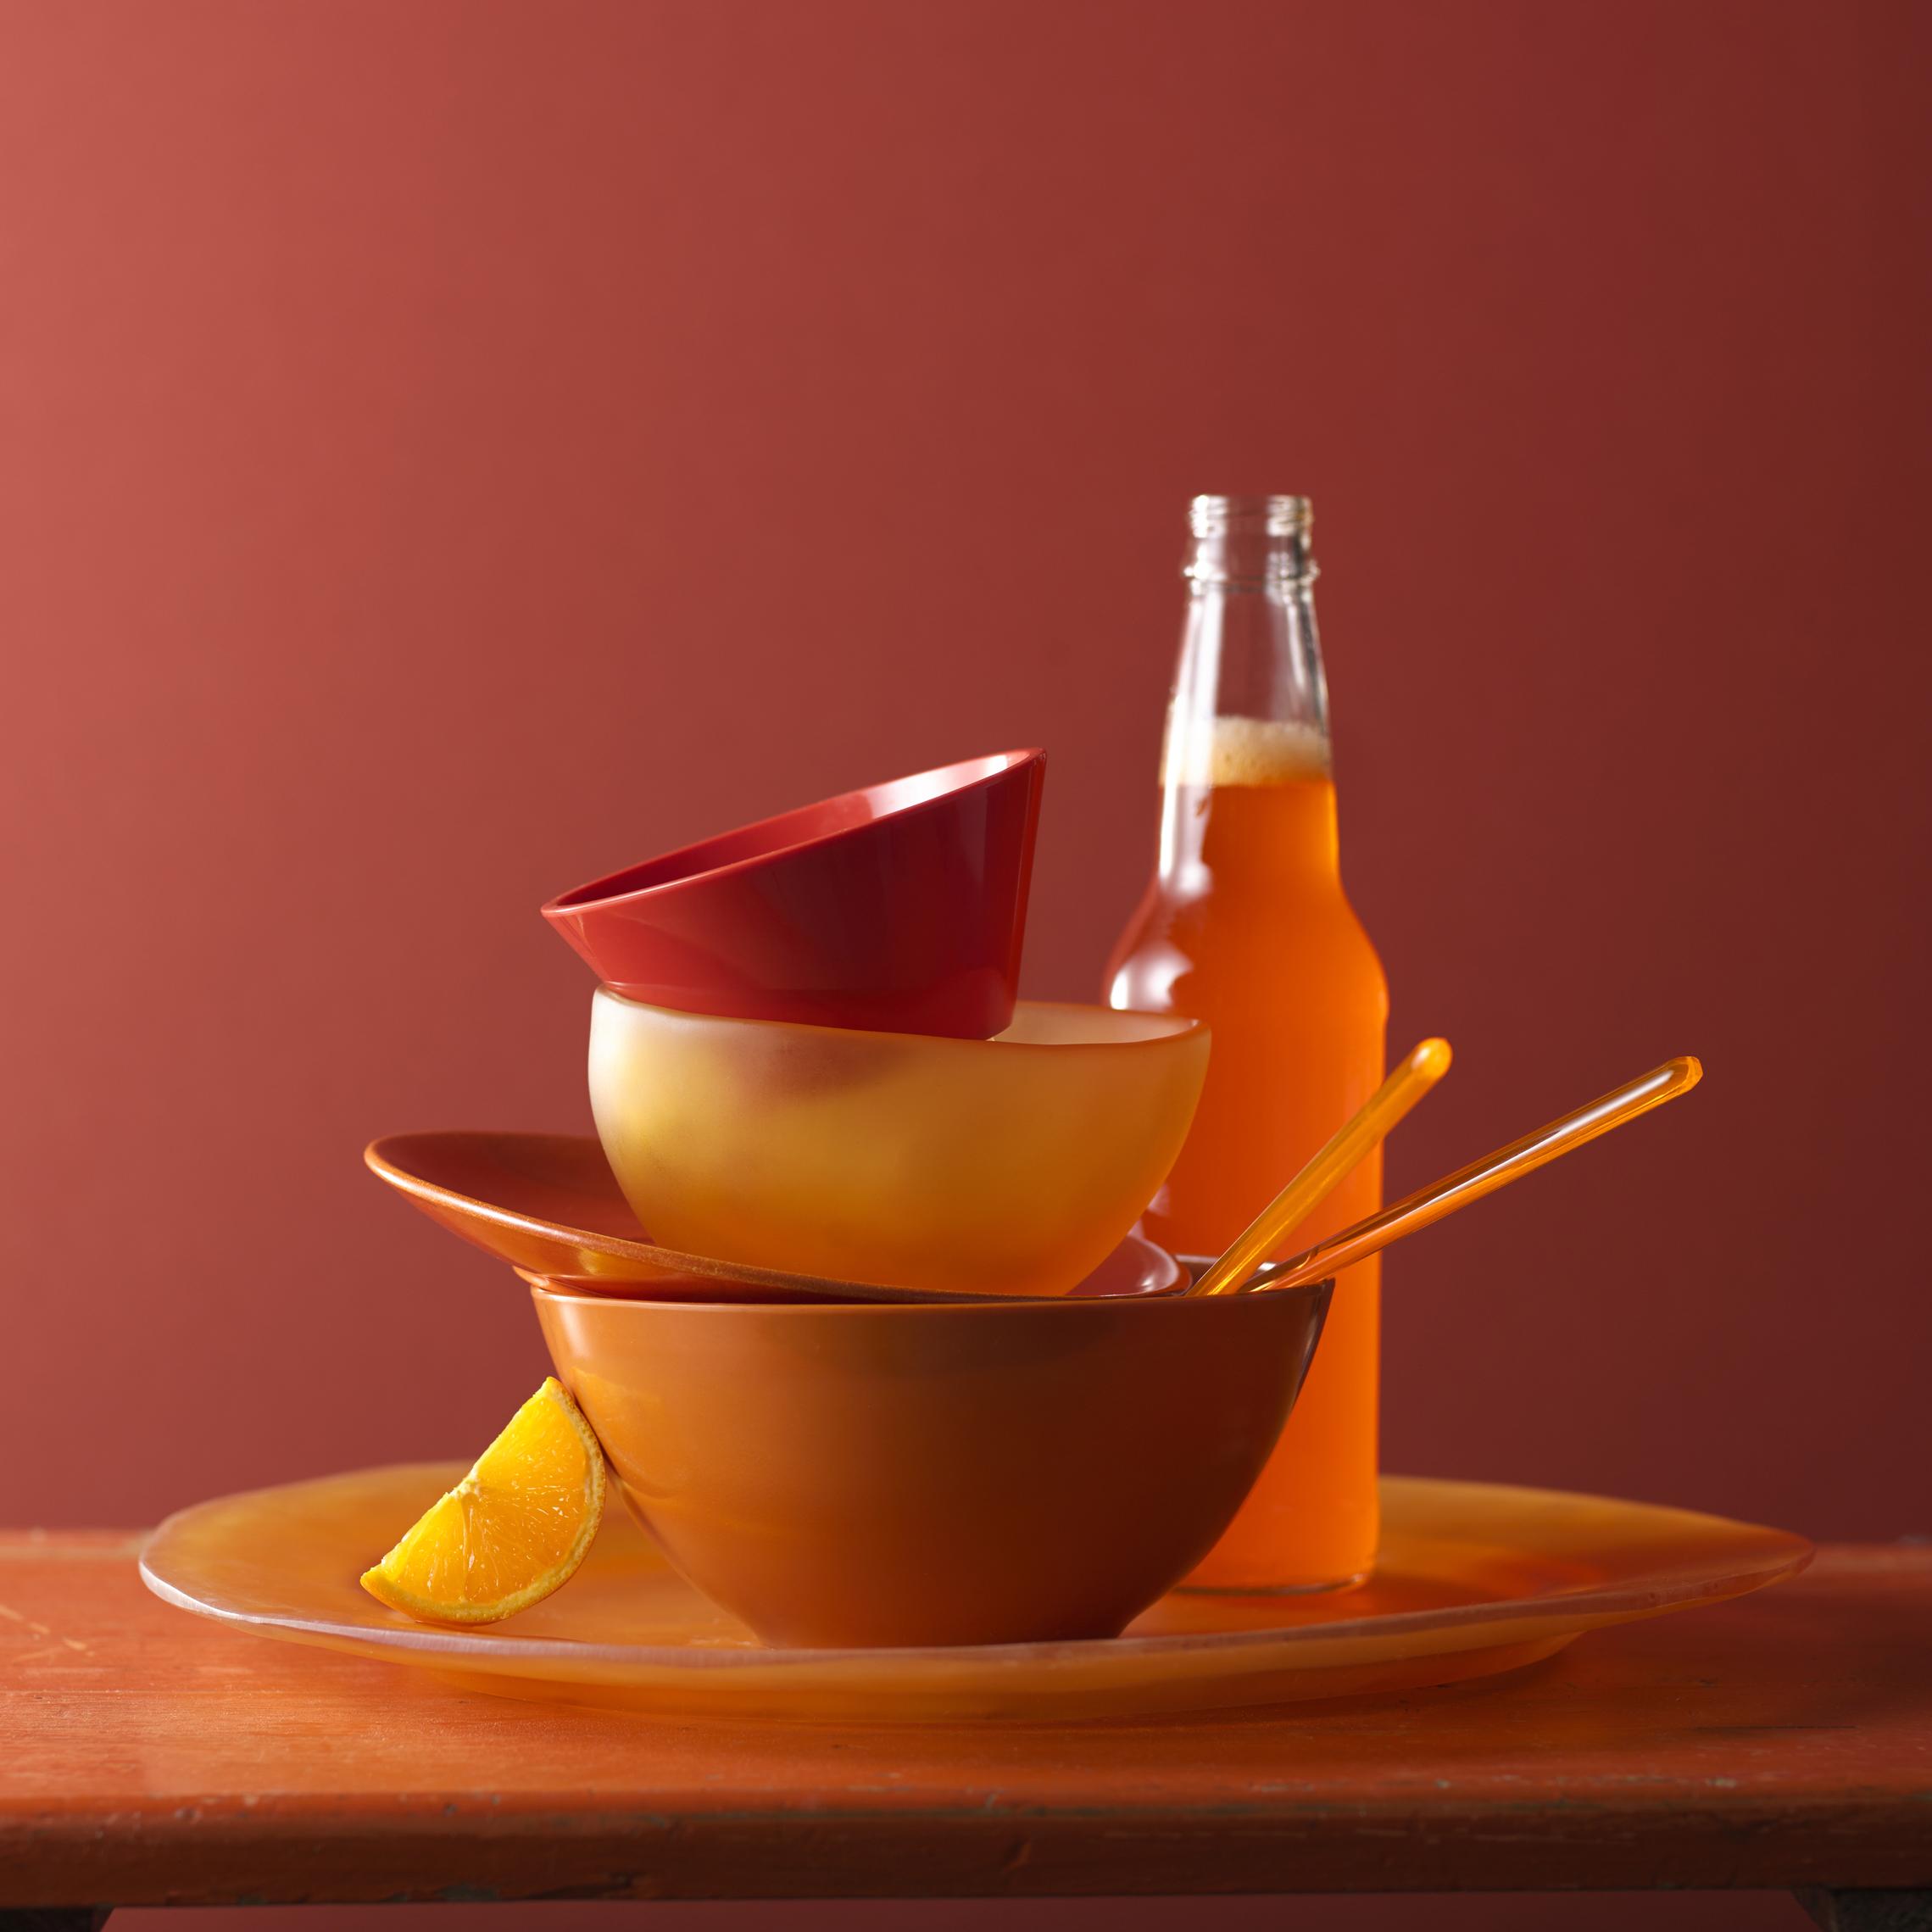 Food & Beverage Props | Tony Kubat Photography